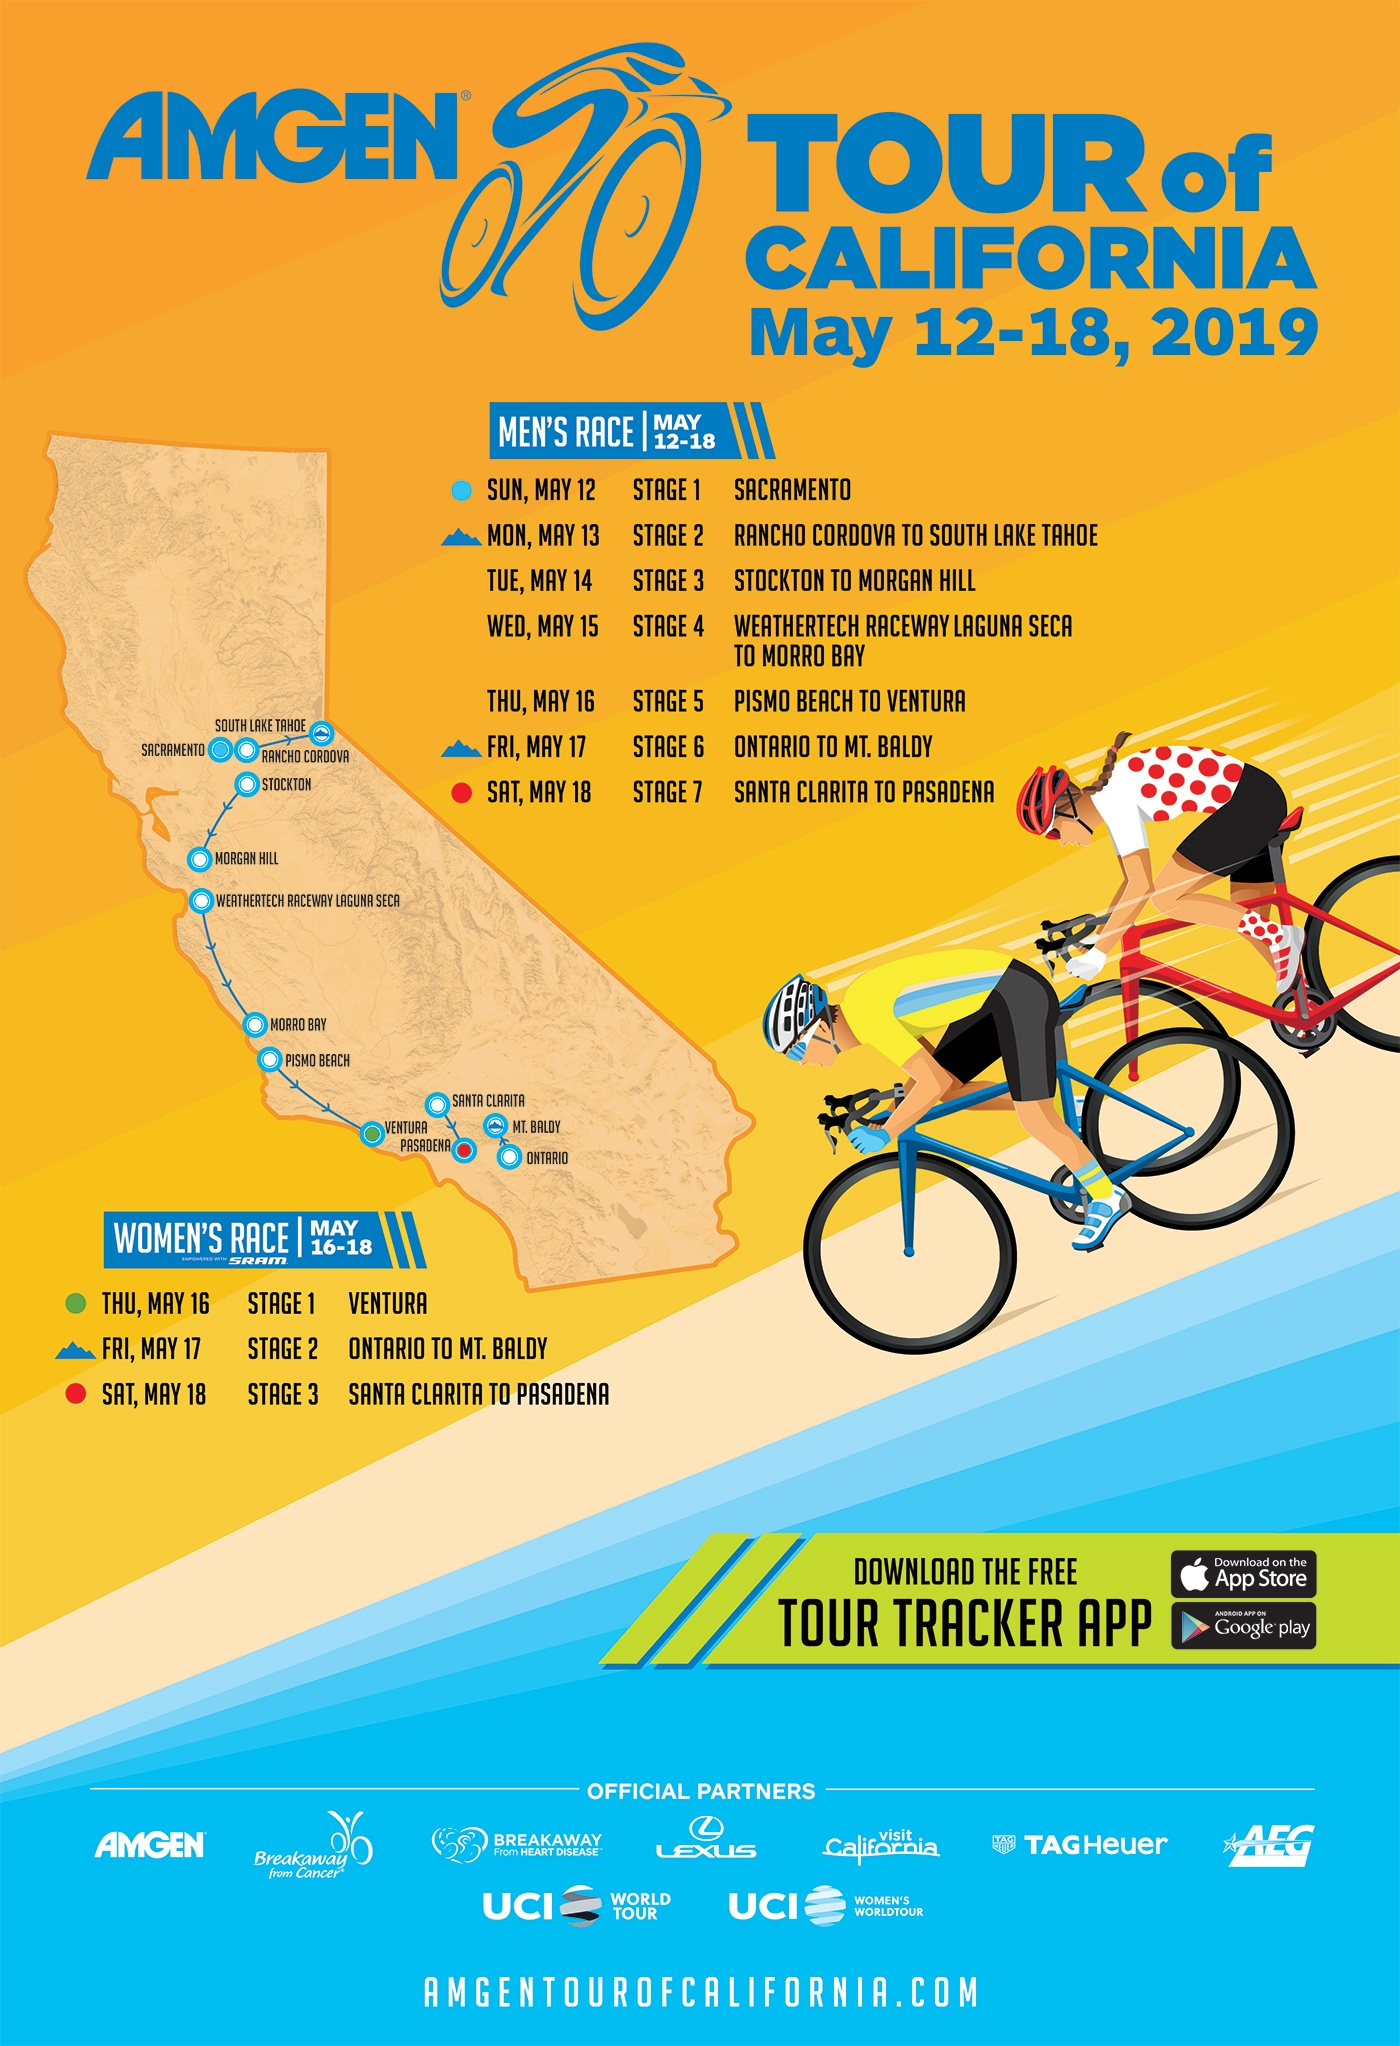 Amgen Tour 2019 2019 Amgen Tour of California Host Cities Announced | Road Bike Action